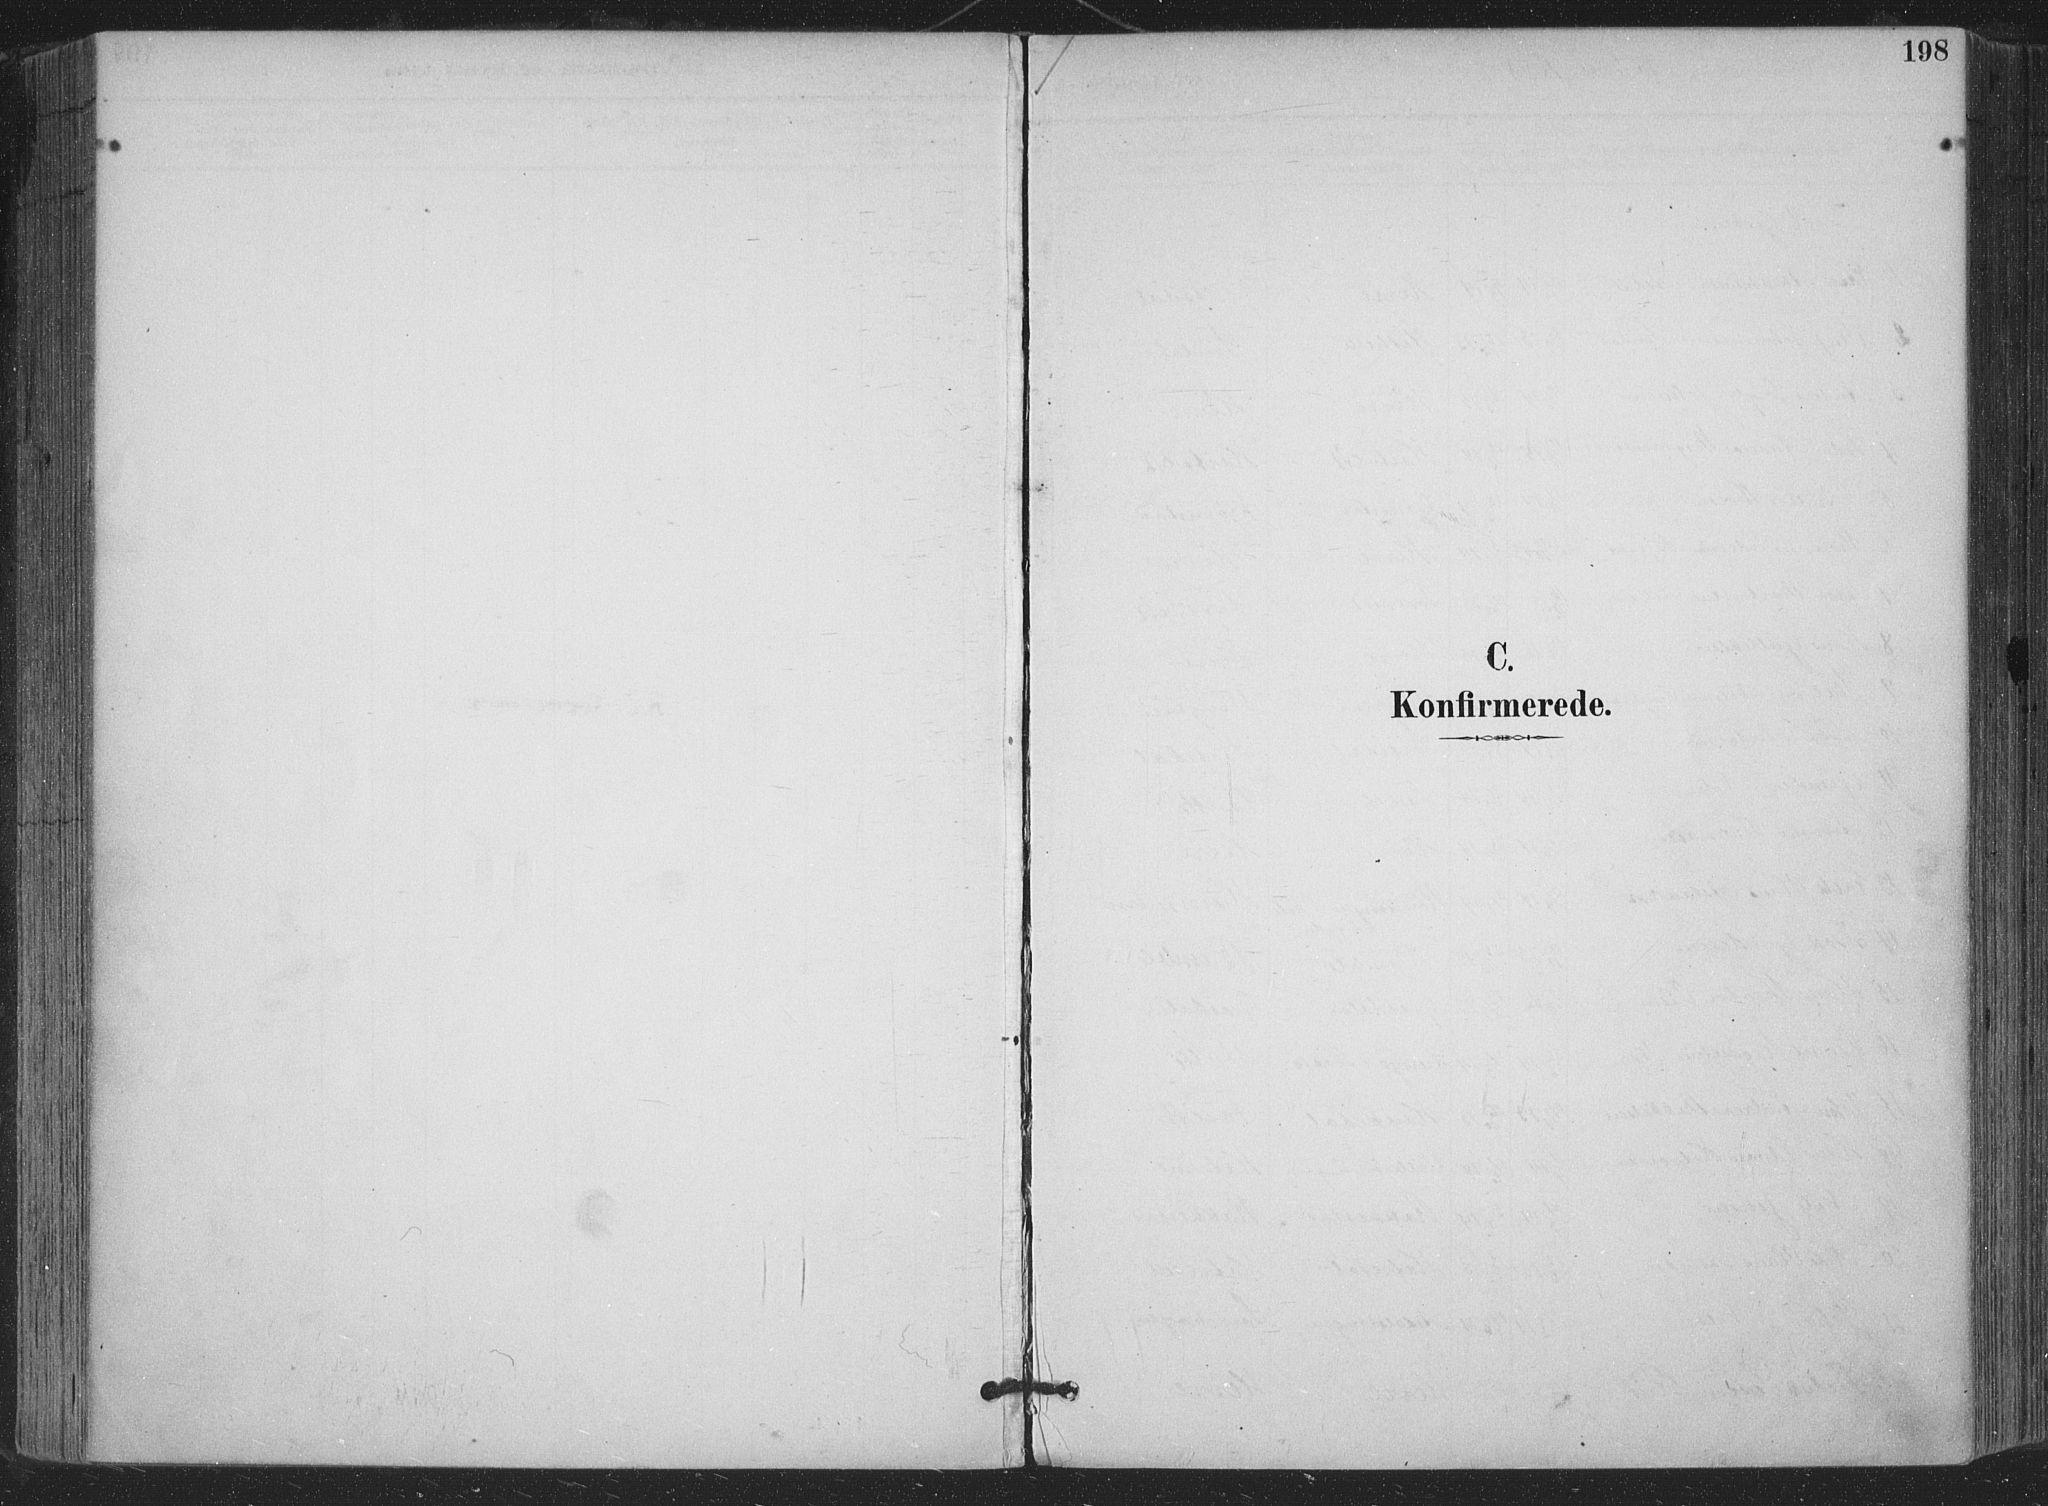 SAKO, Bamble kirkebøker, F/Fa/L0008: Ministerialbok nr. I 8, 1888-1900, s. 198